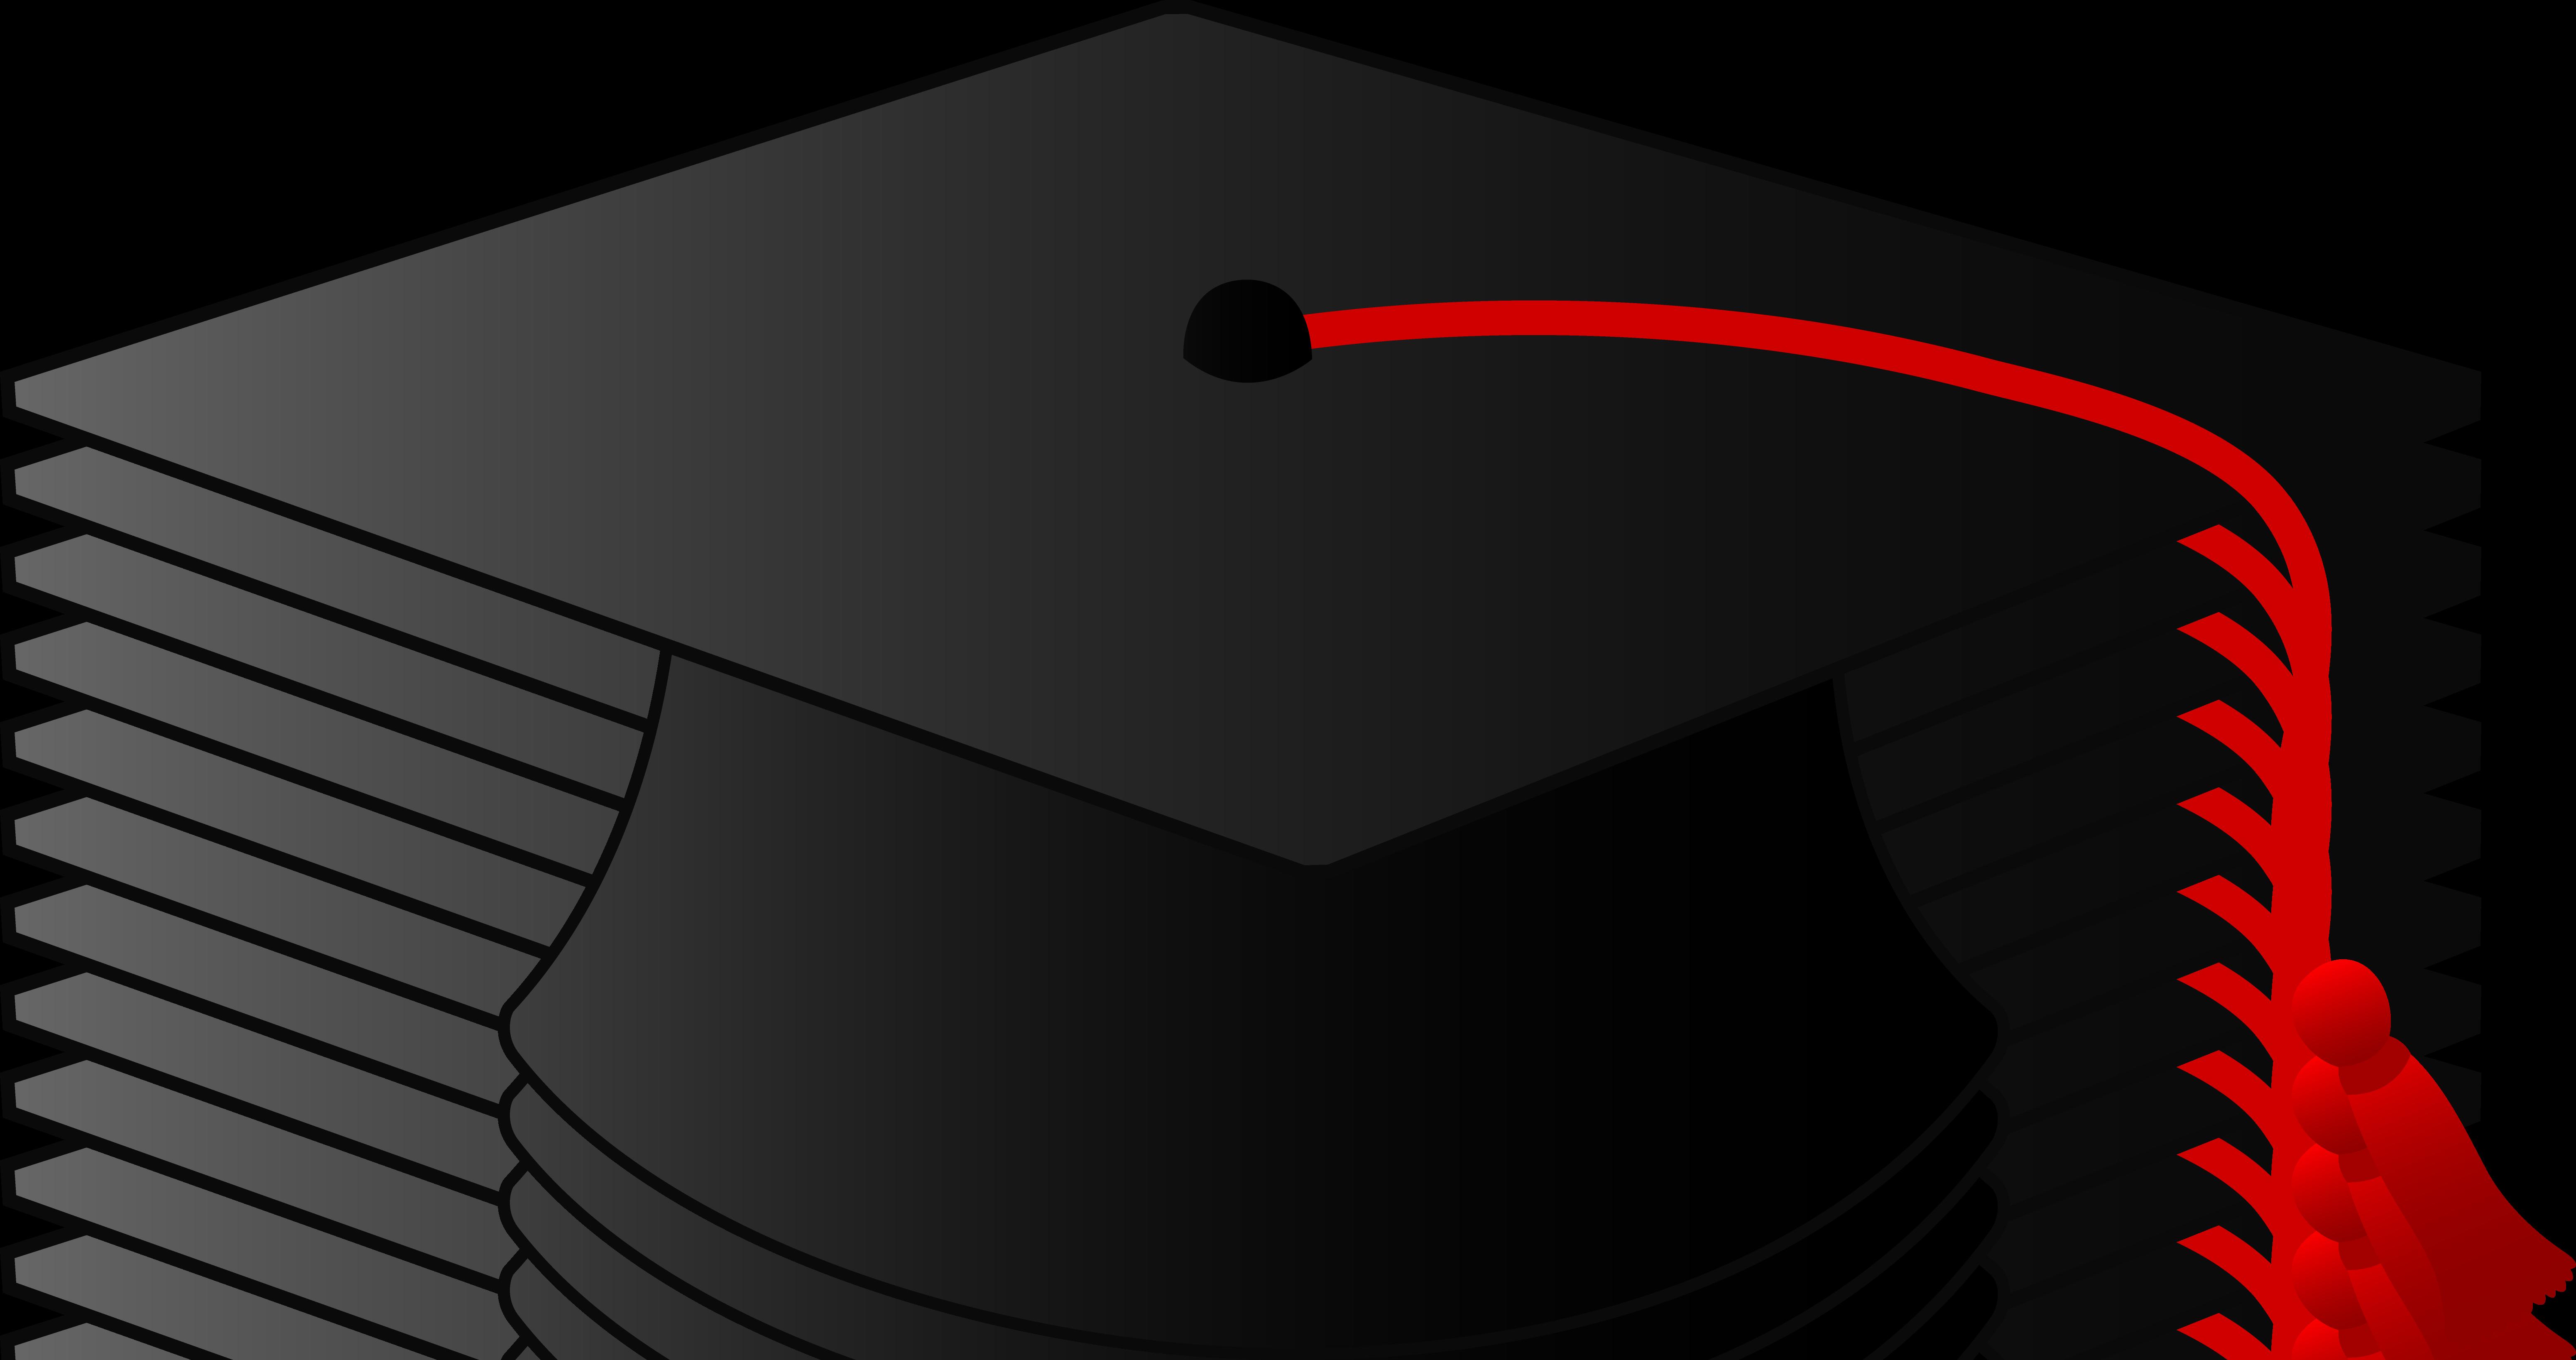 Clipart graduation hat - .-Clipart graduation hat - .-7